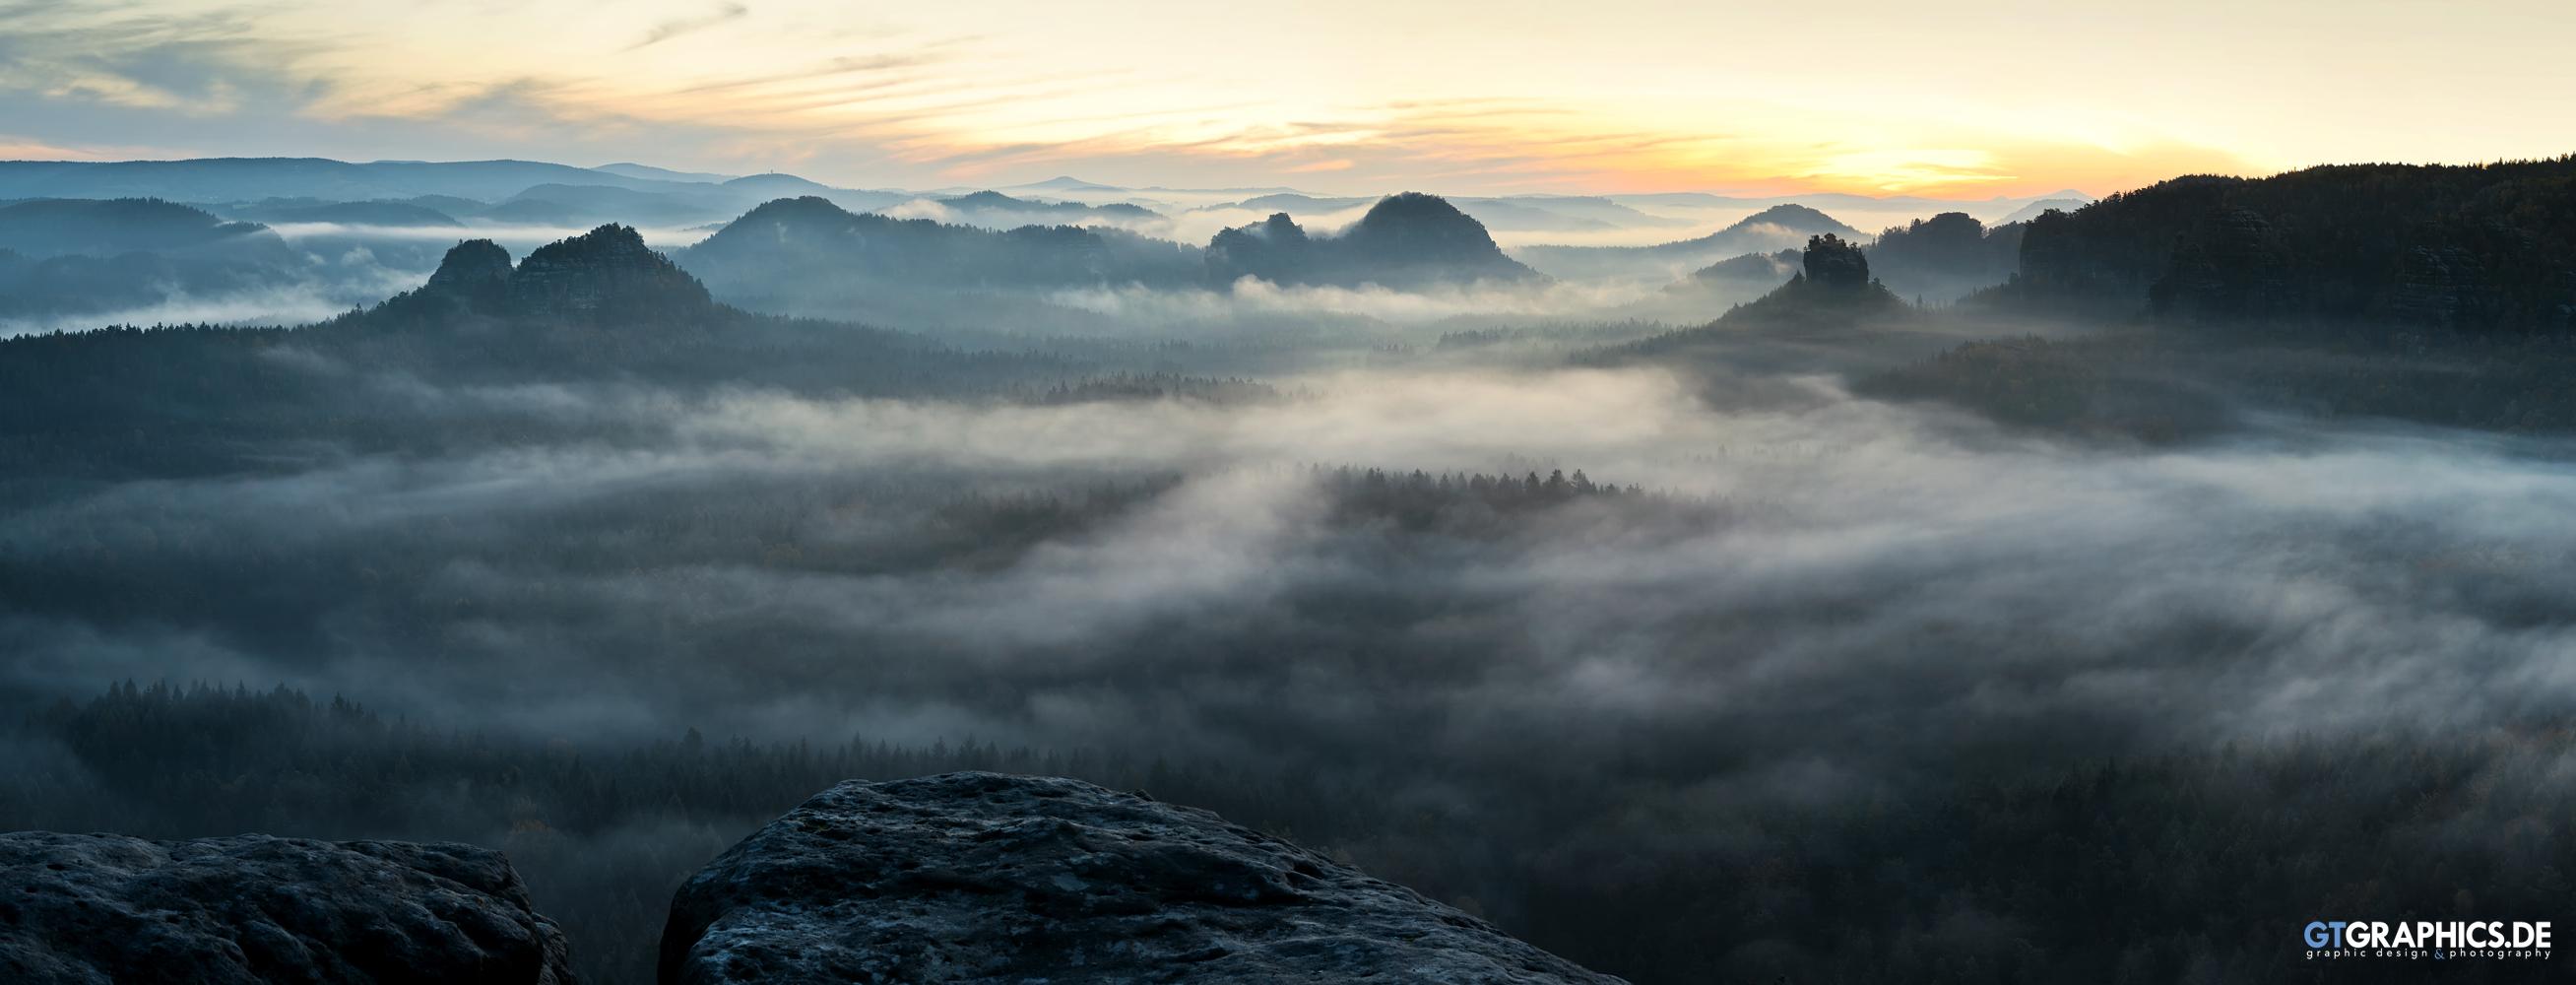 Zschand Panorama by TobiasRoetsch